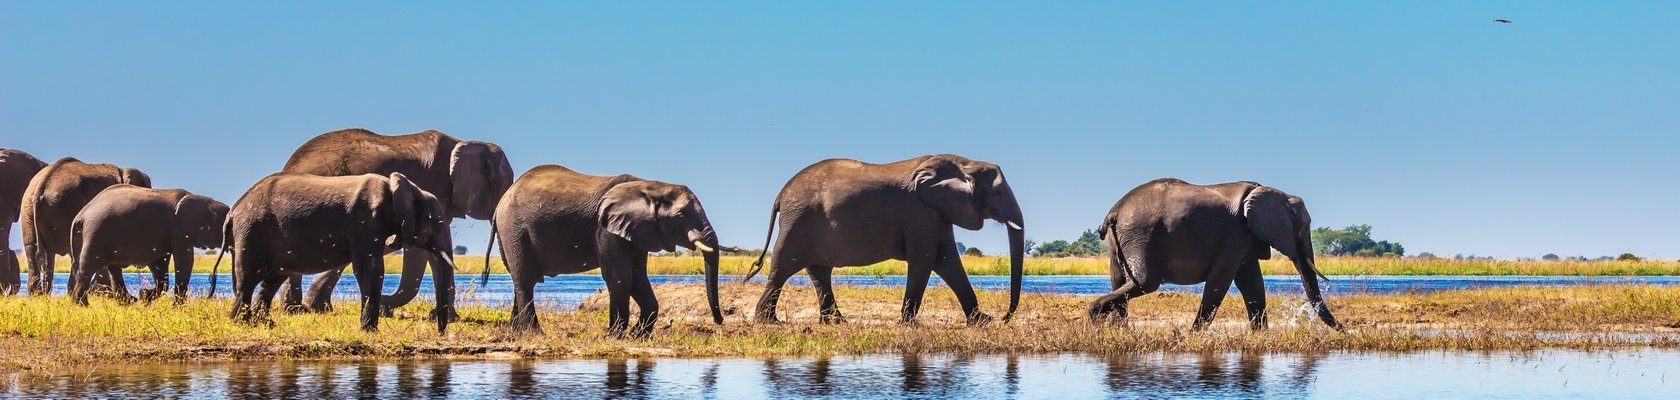 Olifanten in Chobe Nationaal Park